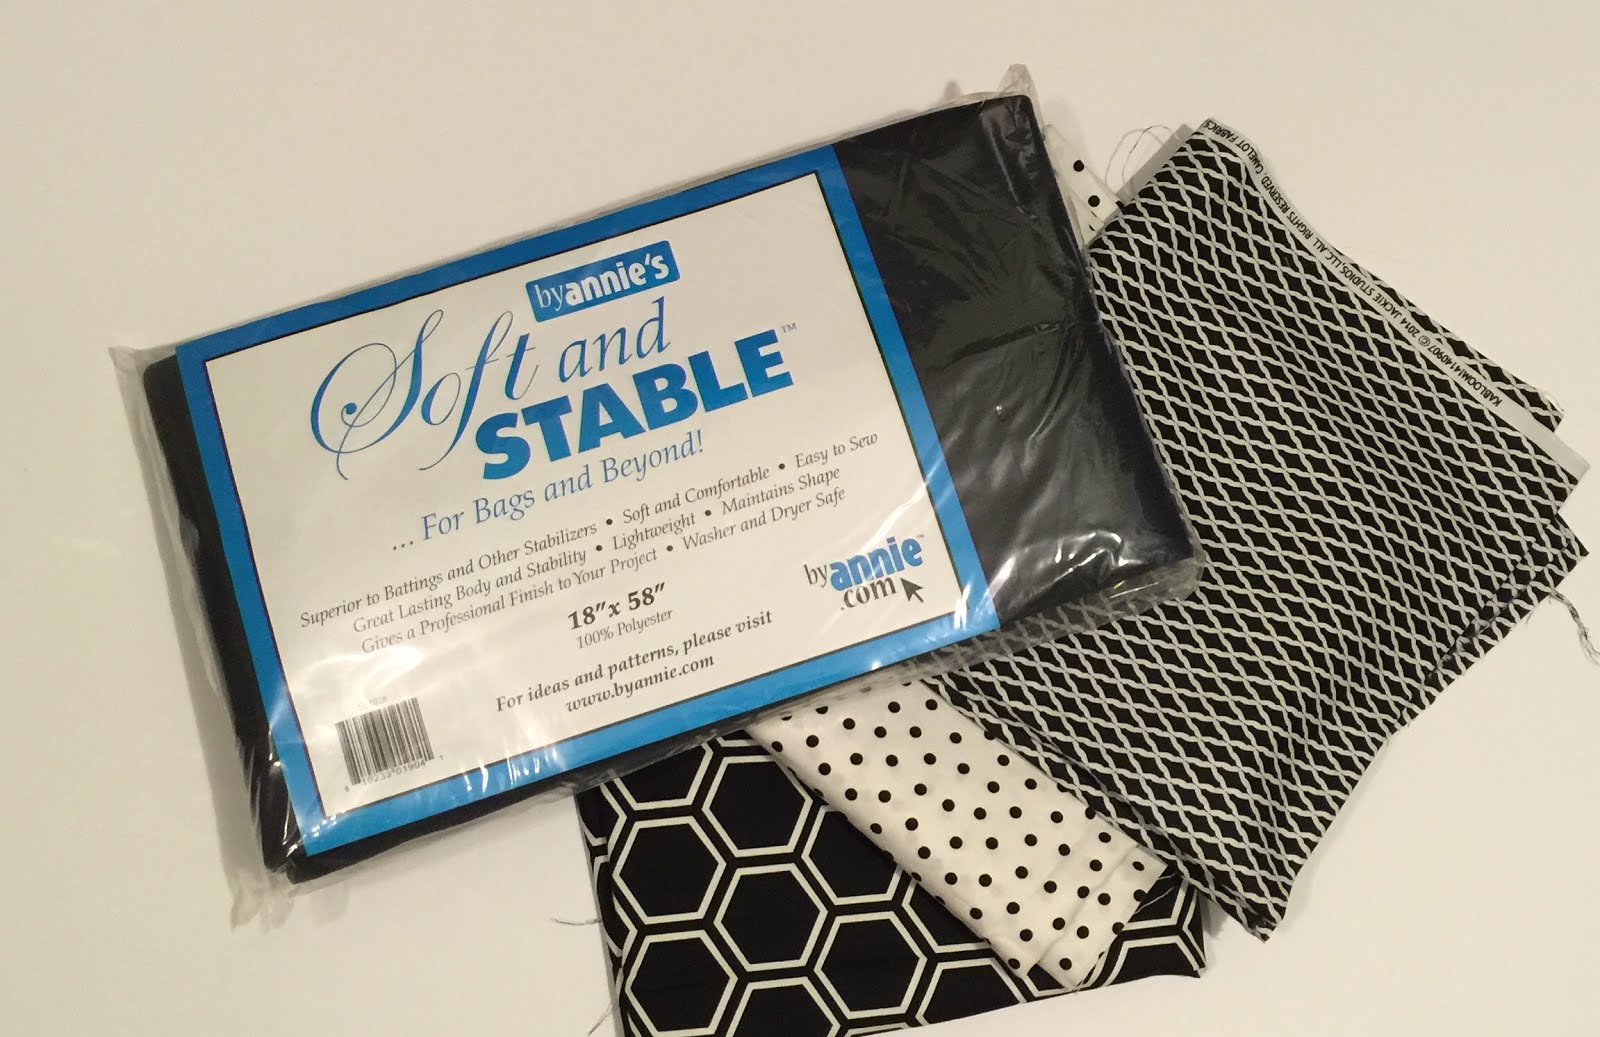 Mrs H - the blog: Foam Stabilisers Comparison 2 0